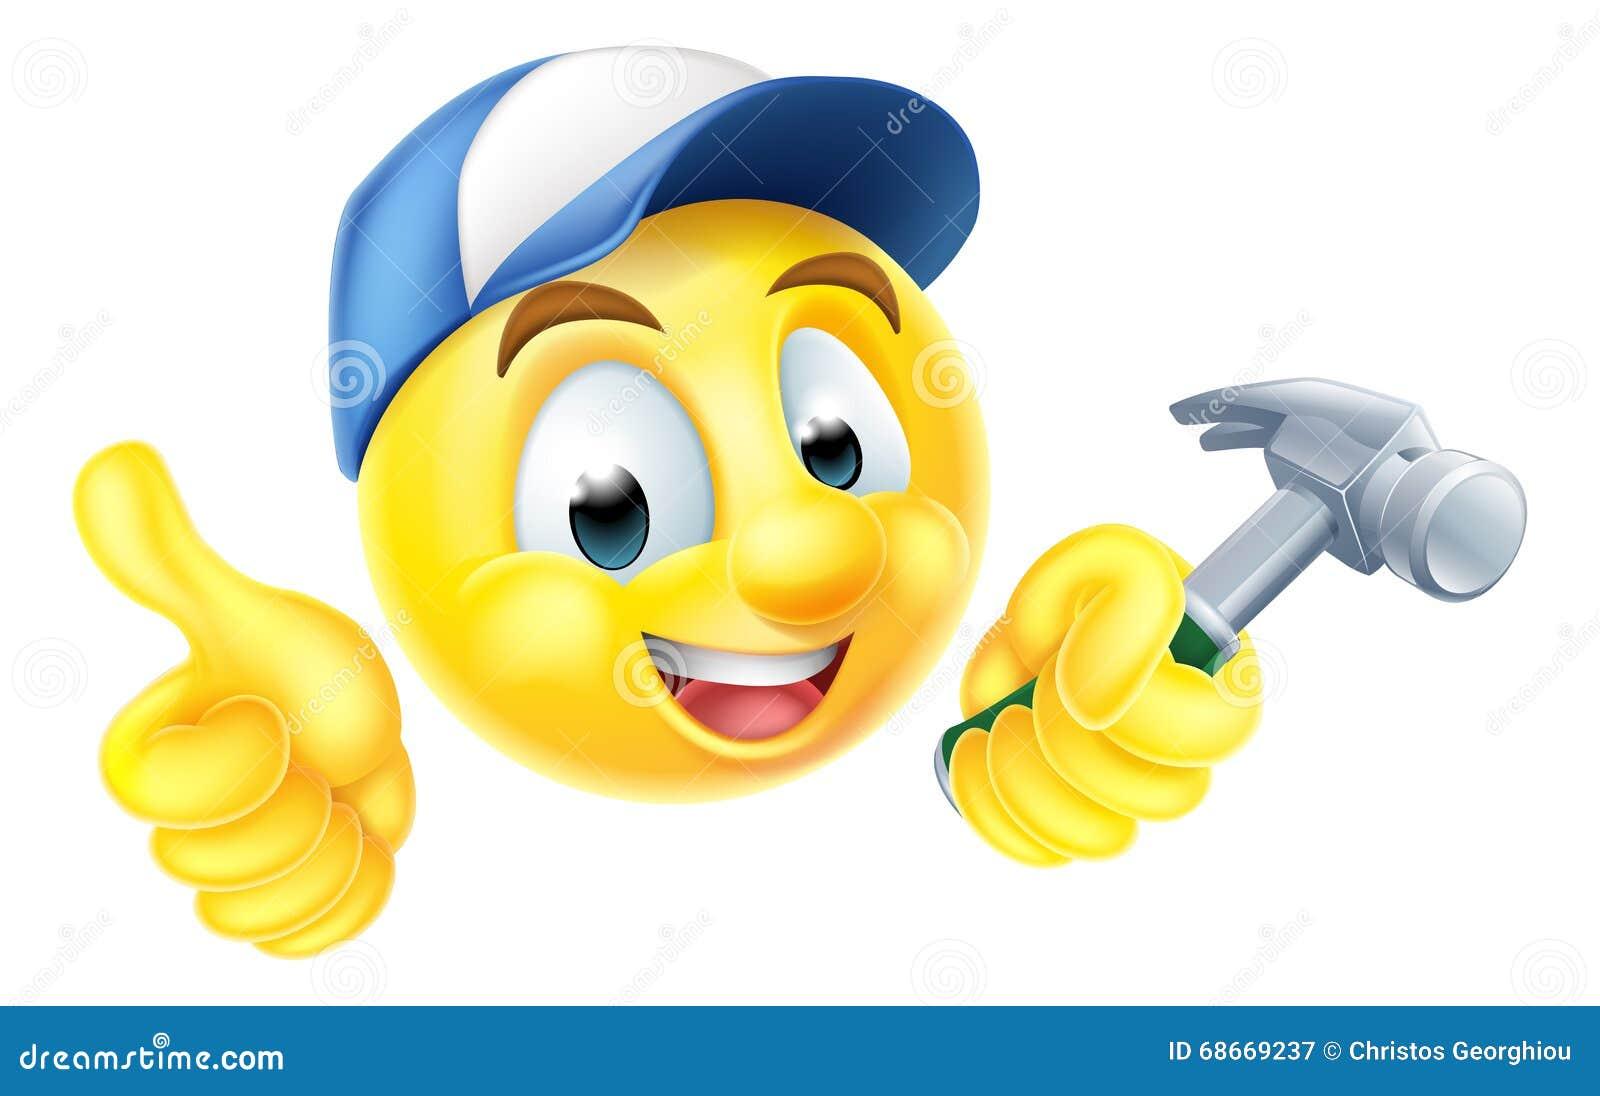 Builder Emoji Stock Illustrations 57 Builder Emoji Stock Illustrations Vectors Clipart Dreamstime